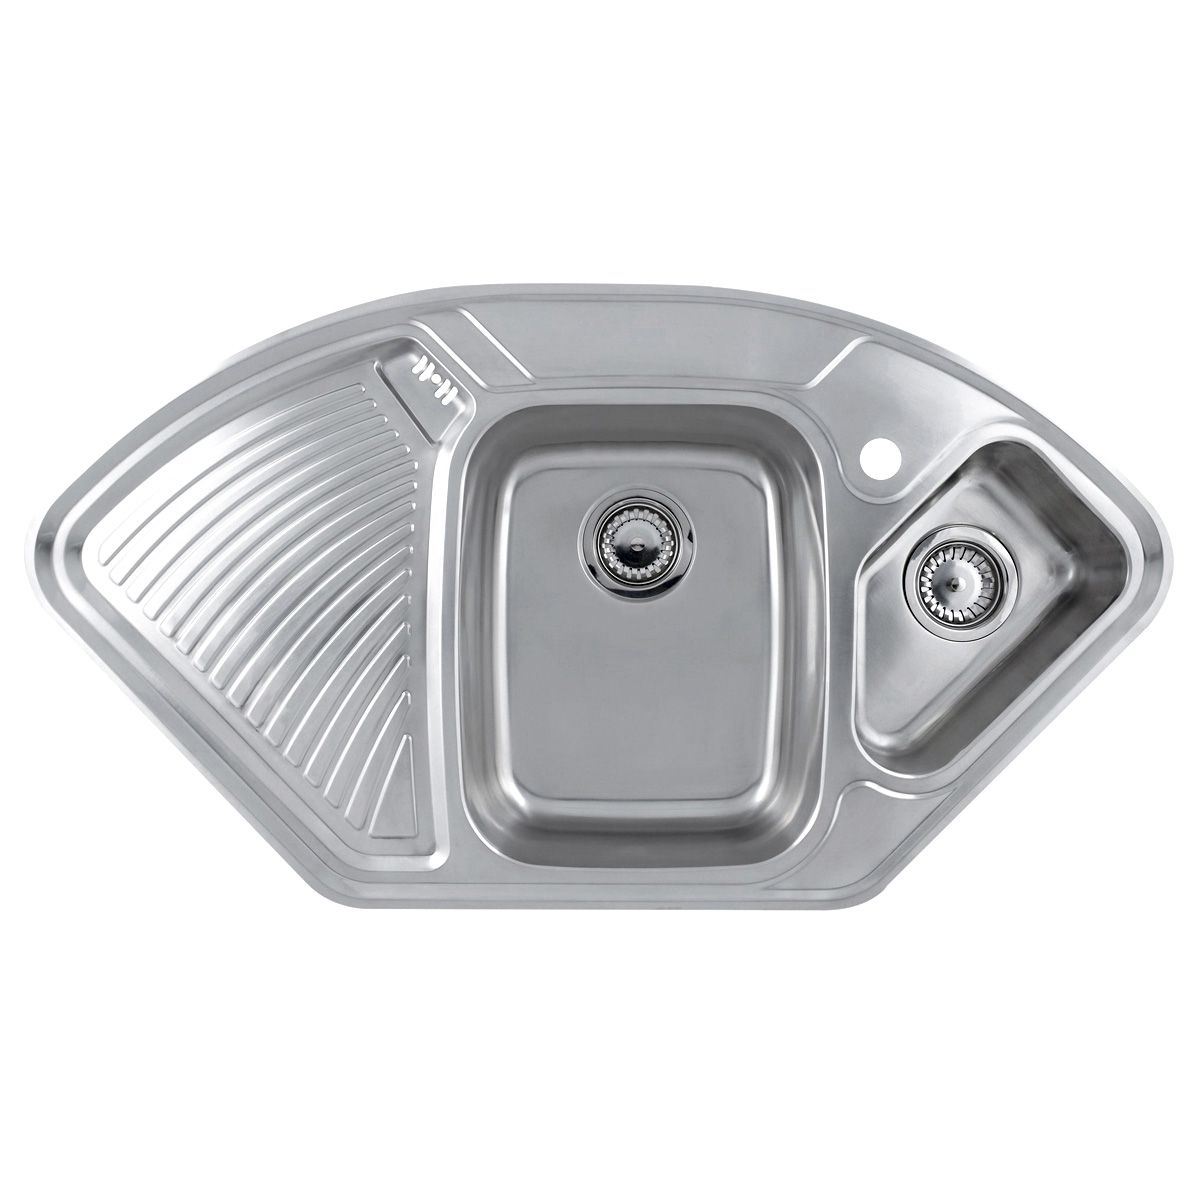 Astracast LAUSANNE Deluxe 1.5 Bowl Corner Kitchen Sink